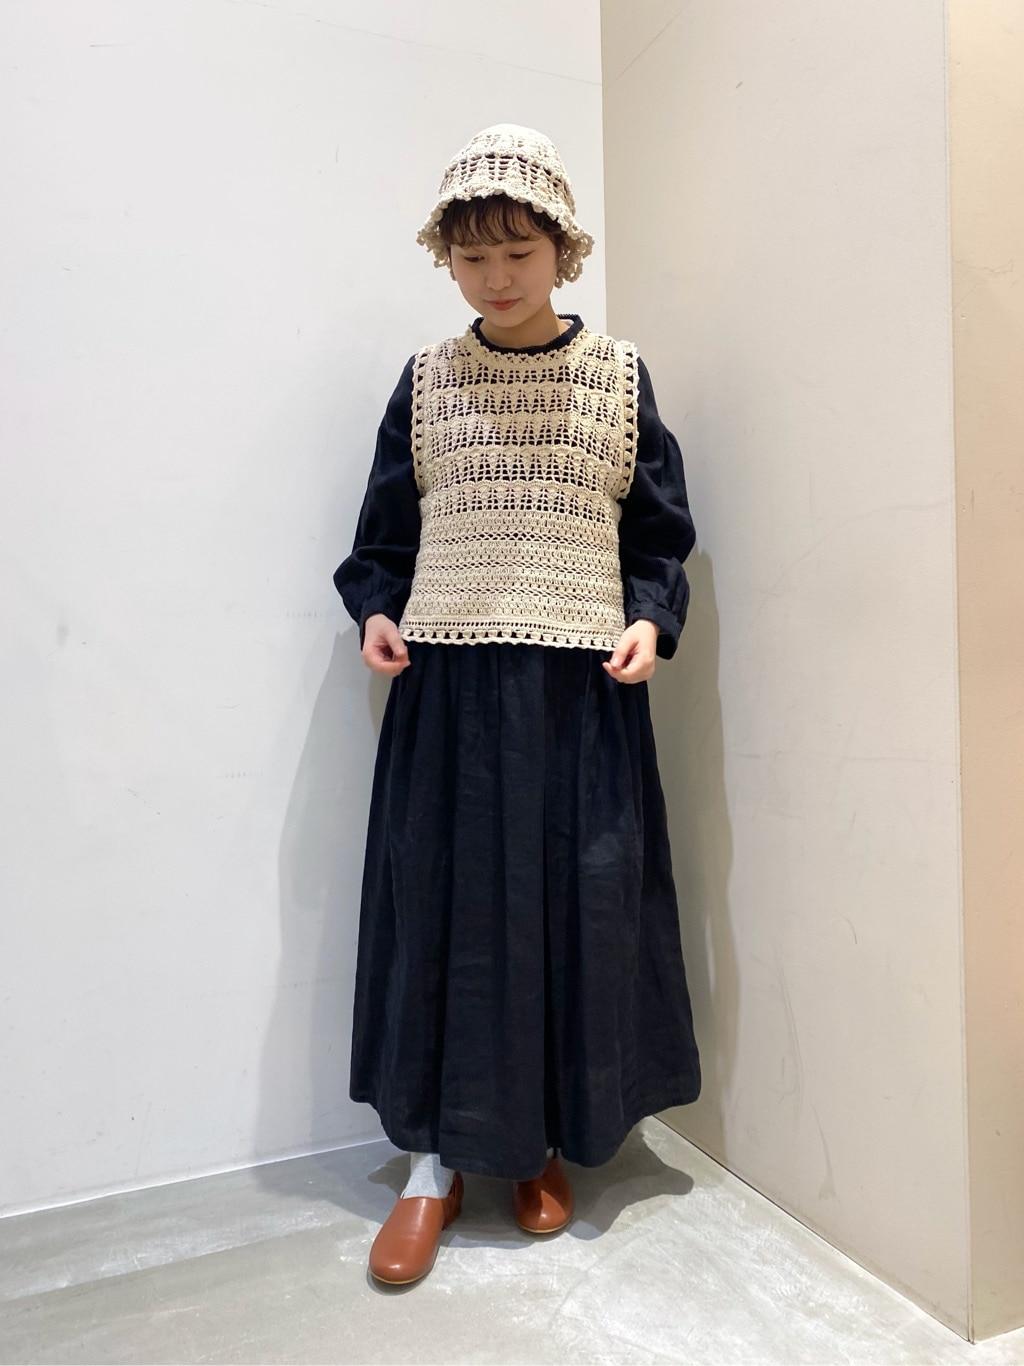 bulle de savon 阪急西宮ガーデンズ 身長:149cm 2021.03.09